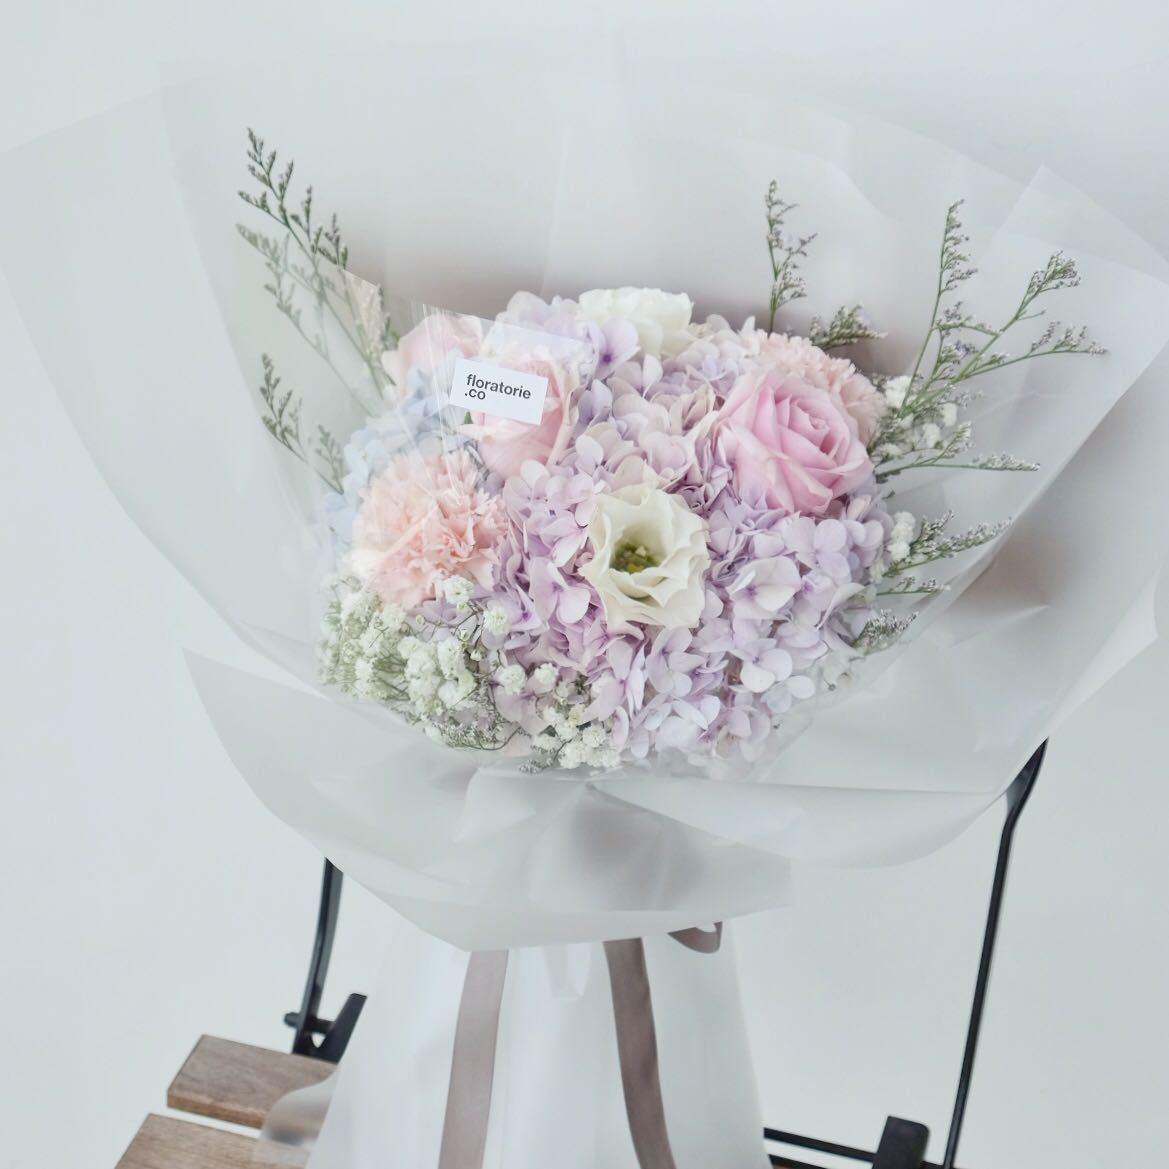 Floratorie - Singapore Online Florist | Flower Delivery | Flower Arrangment Workshop | Featured Collections - Dream